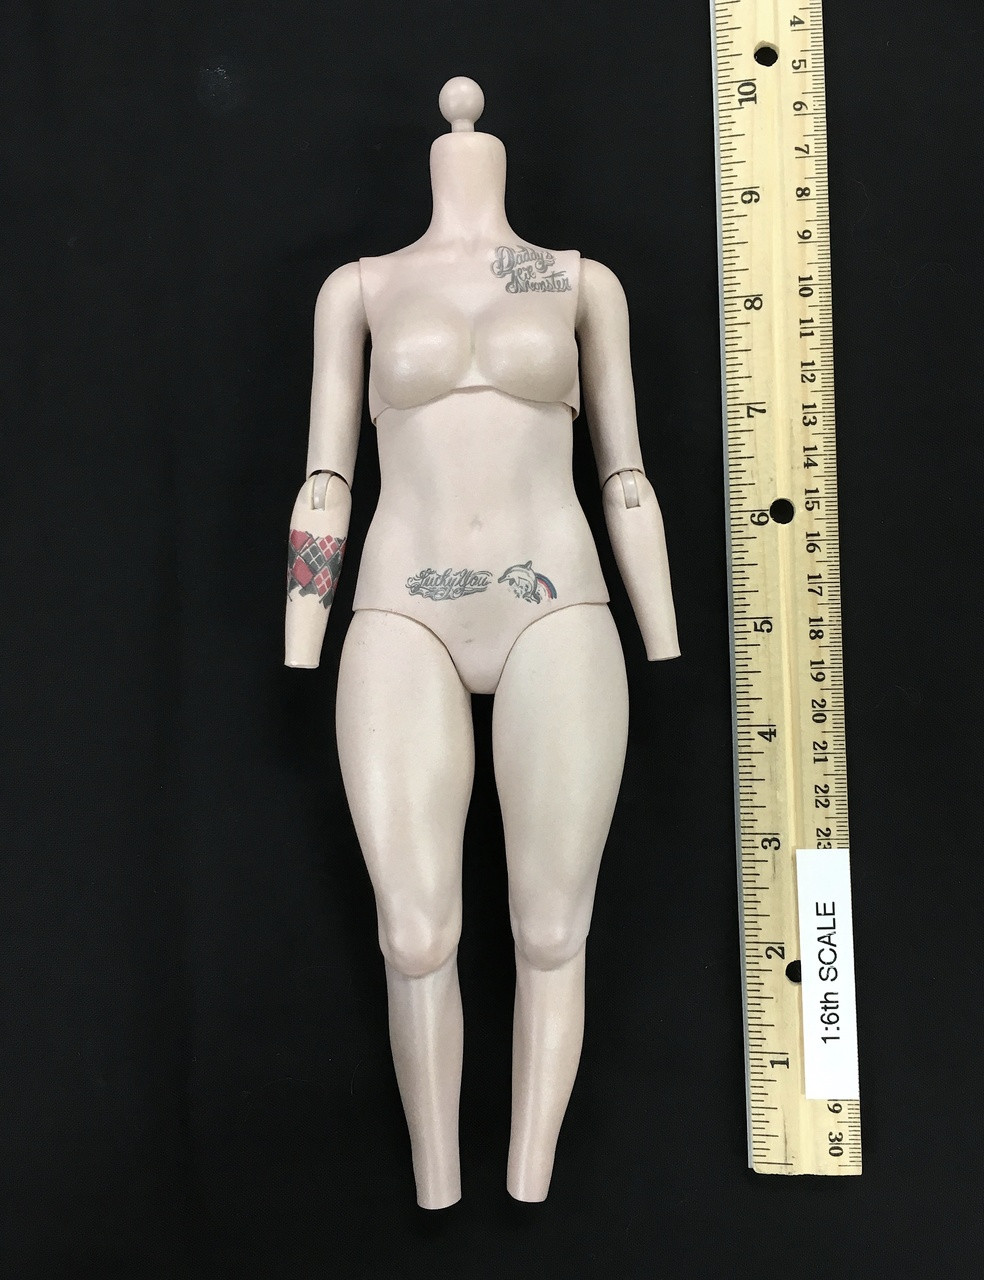 Plus size model alexandra sherbakova